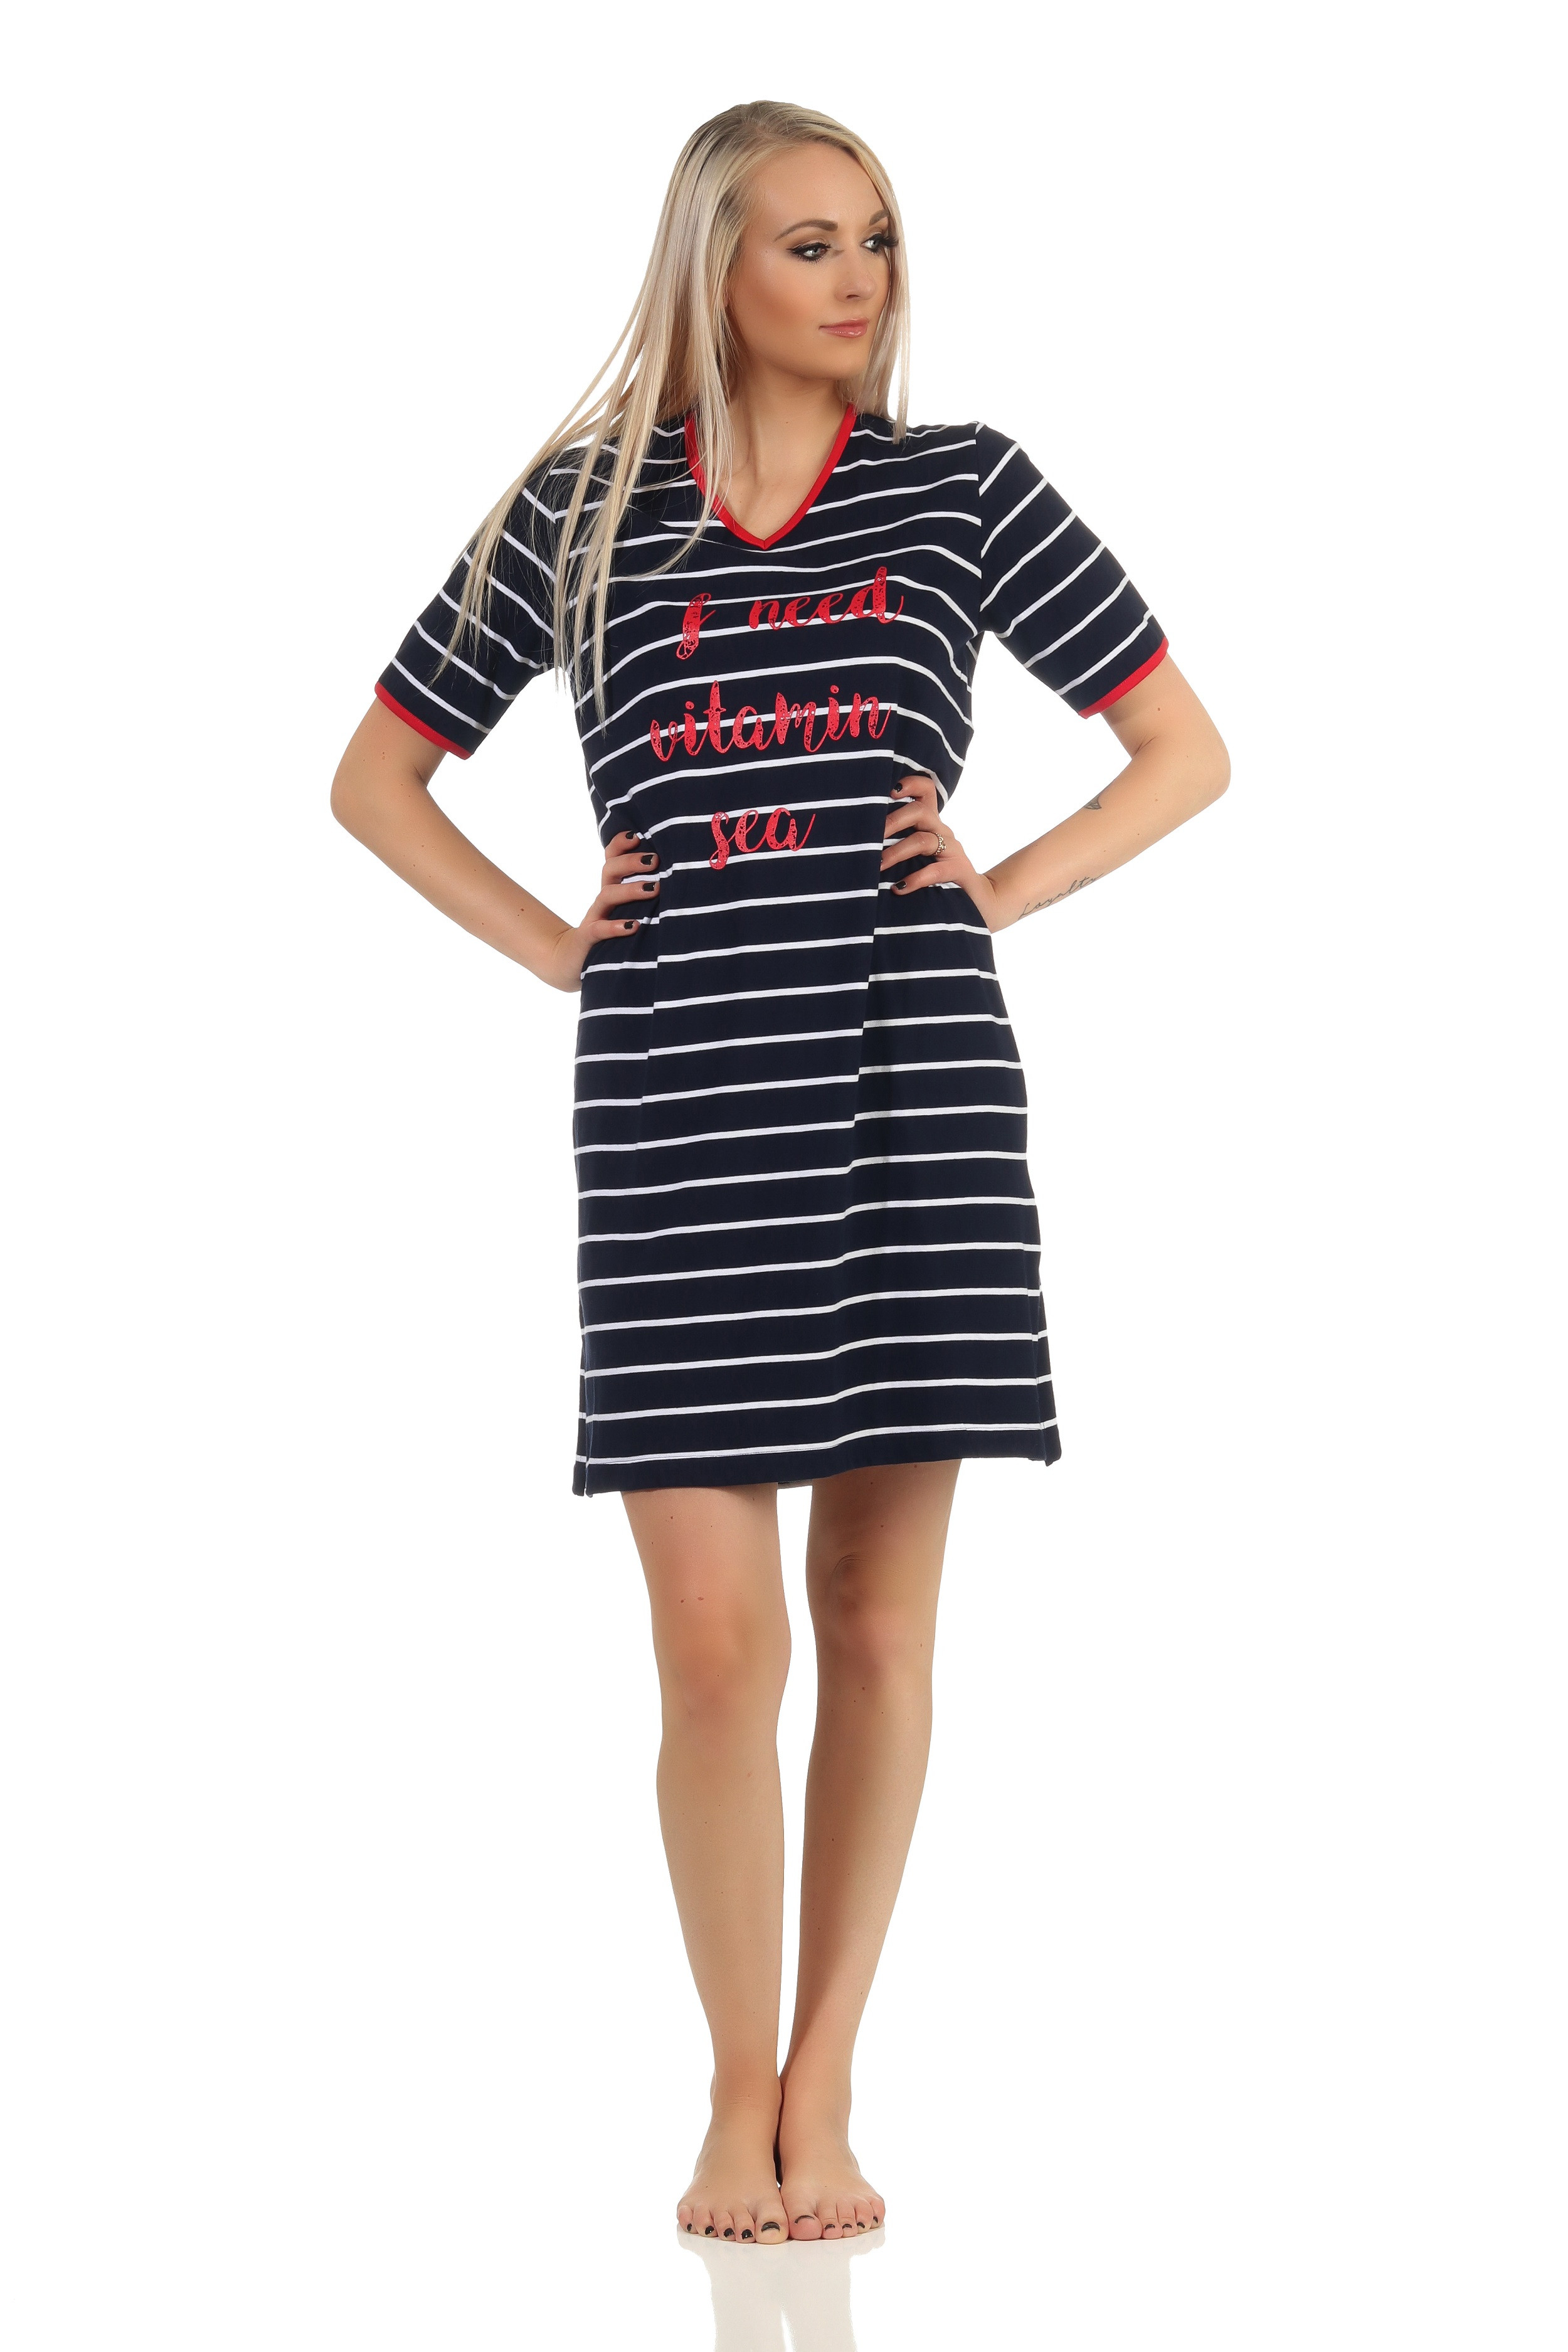 Dames nachthemd Normann 14 90 920-S 36/38-Donker Blauw